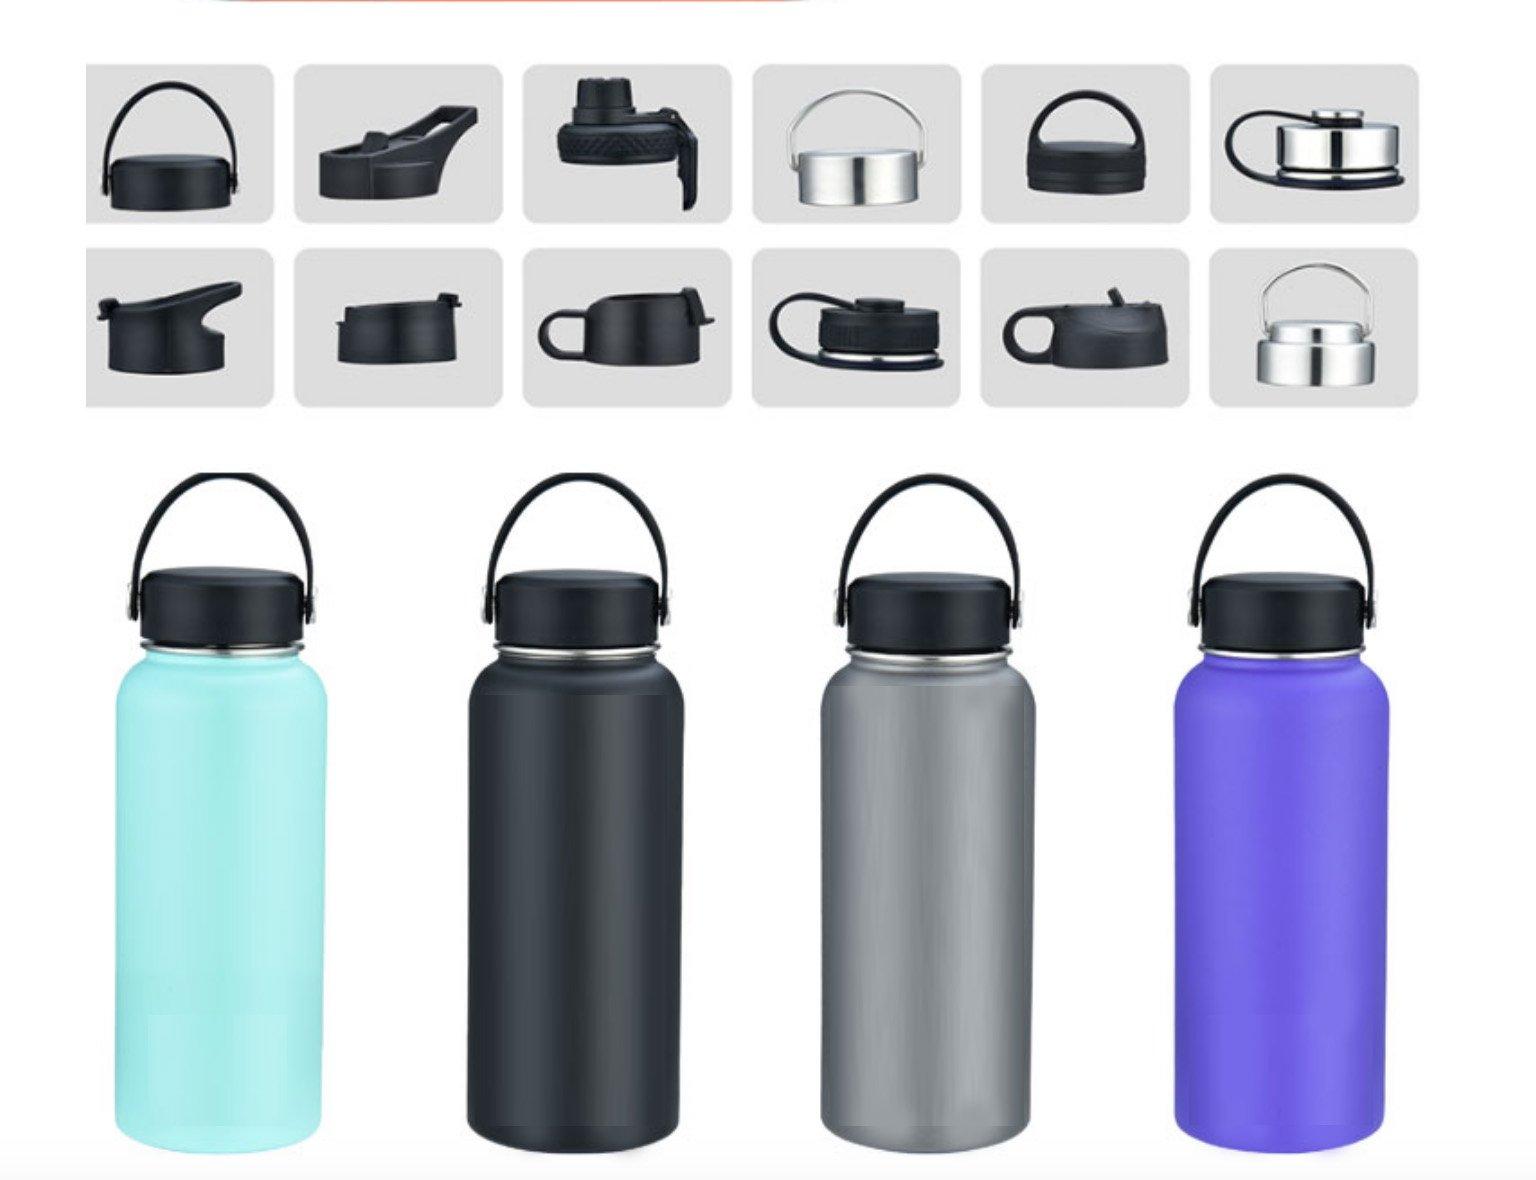 Hydro flask lid